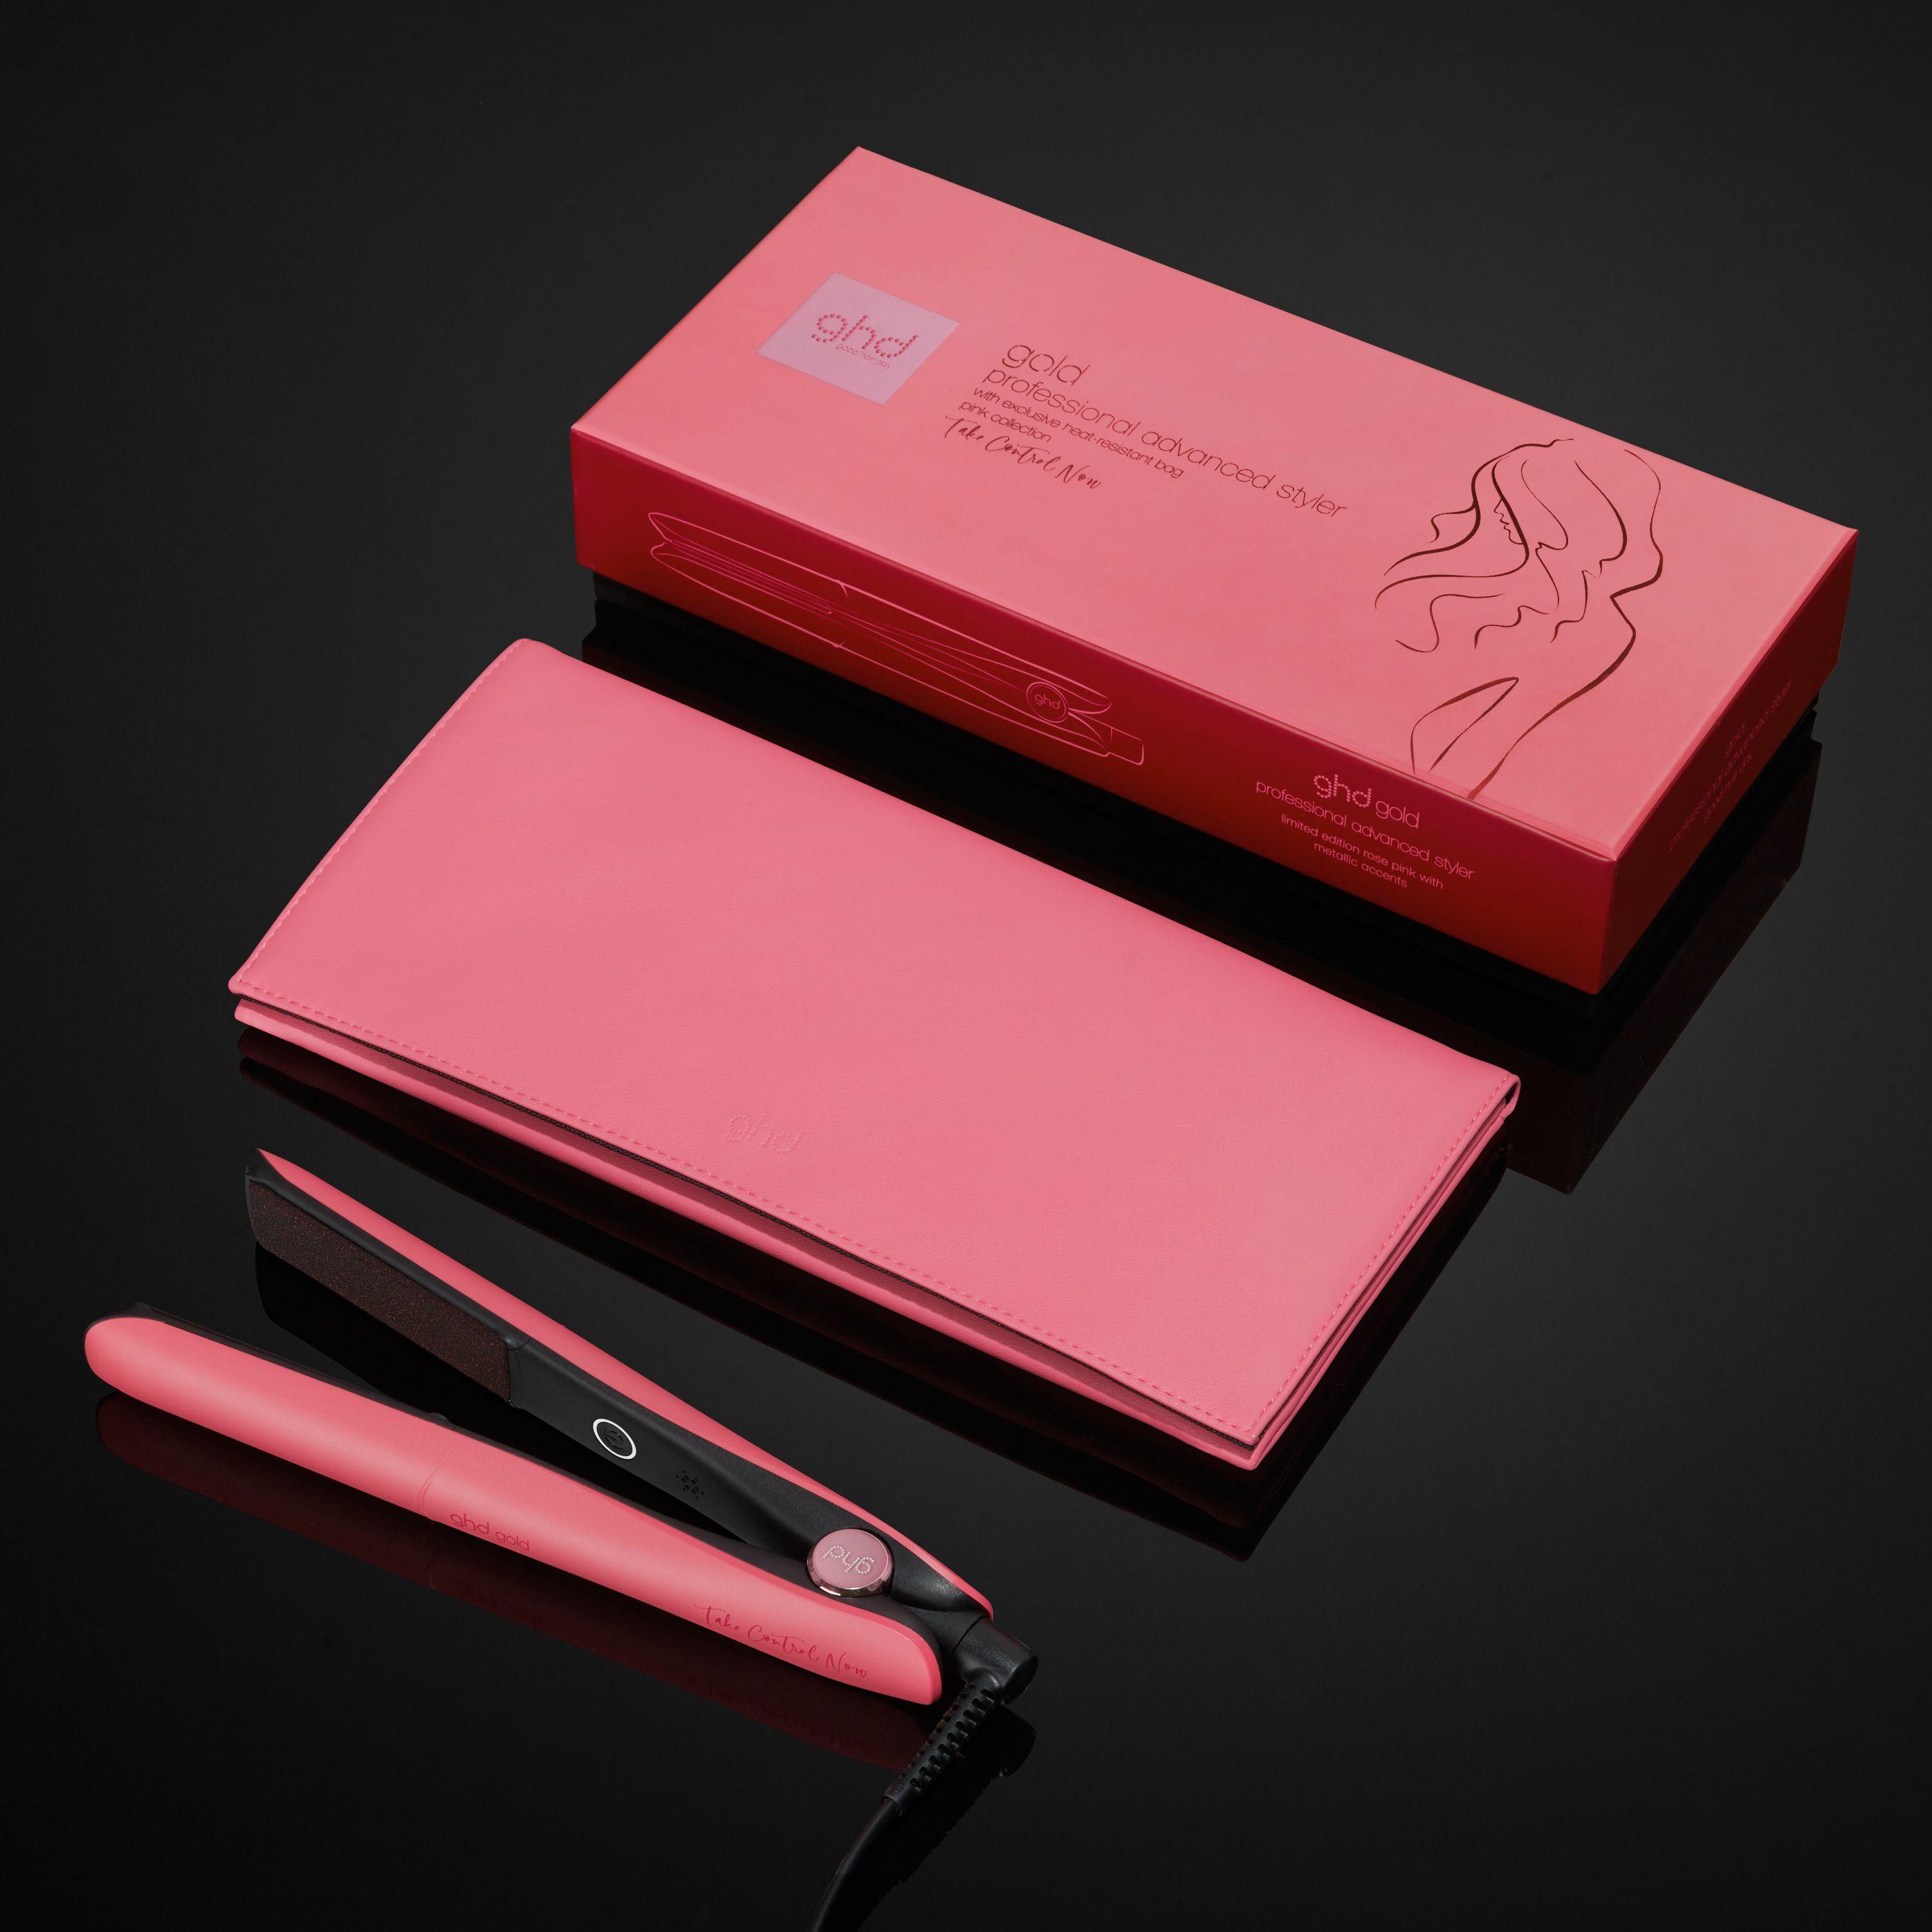 ghd Pink Collection Gold Professional Advanced Styler Glätteisen